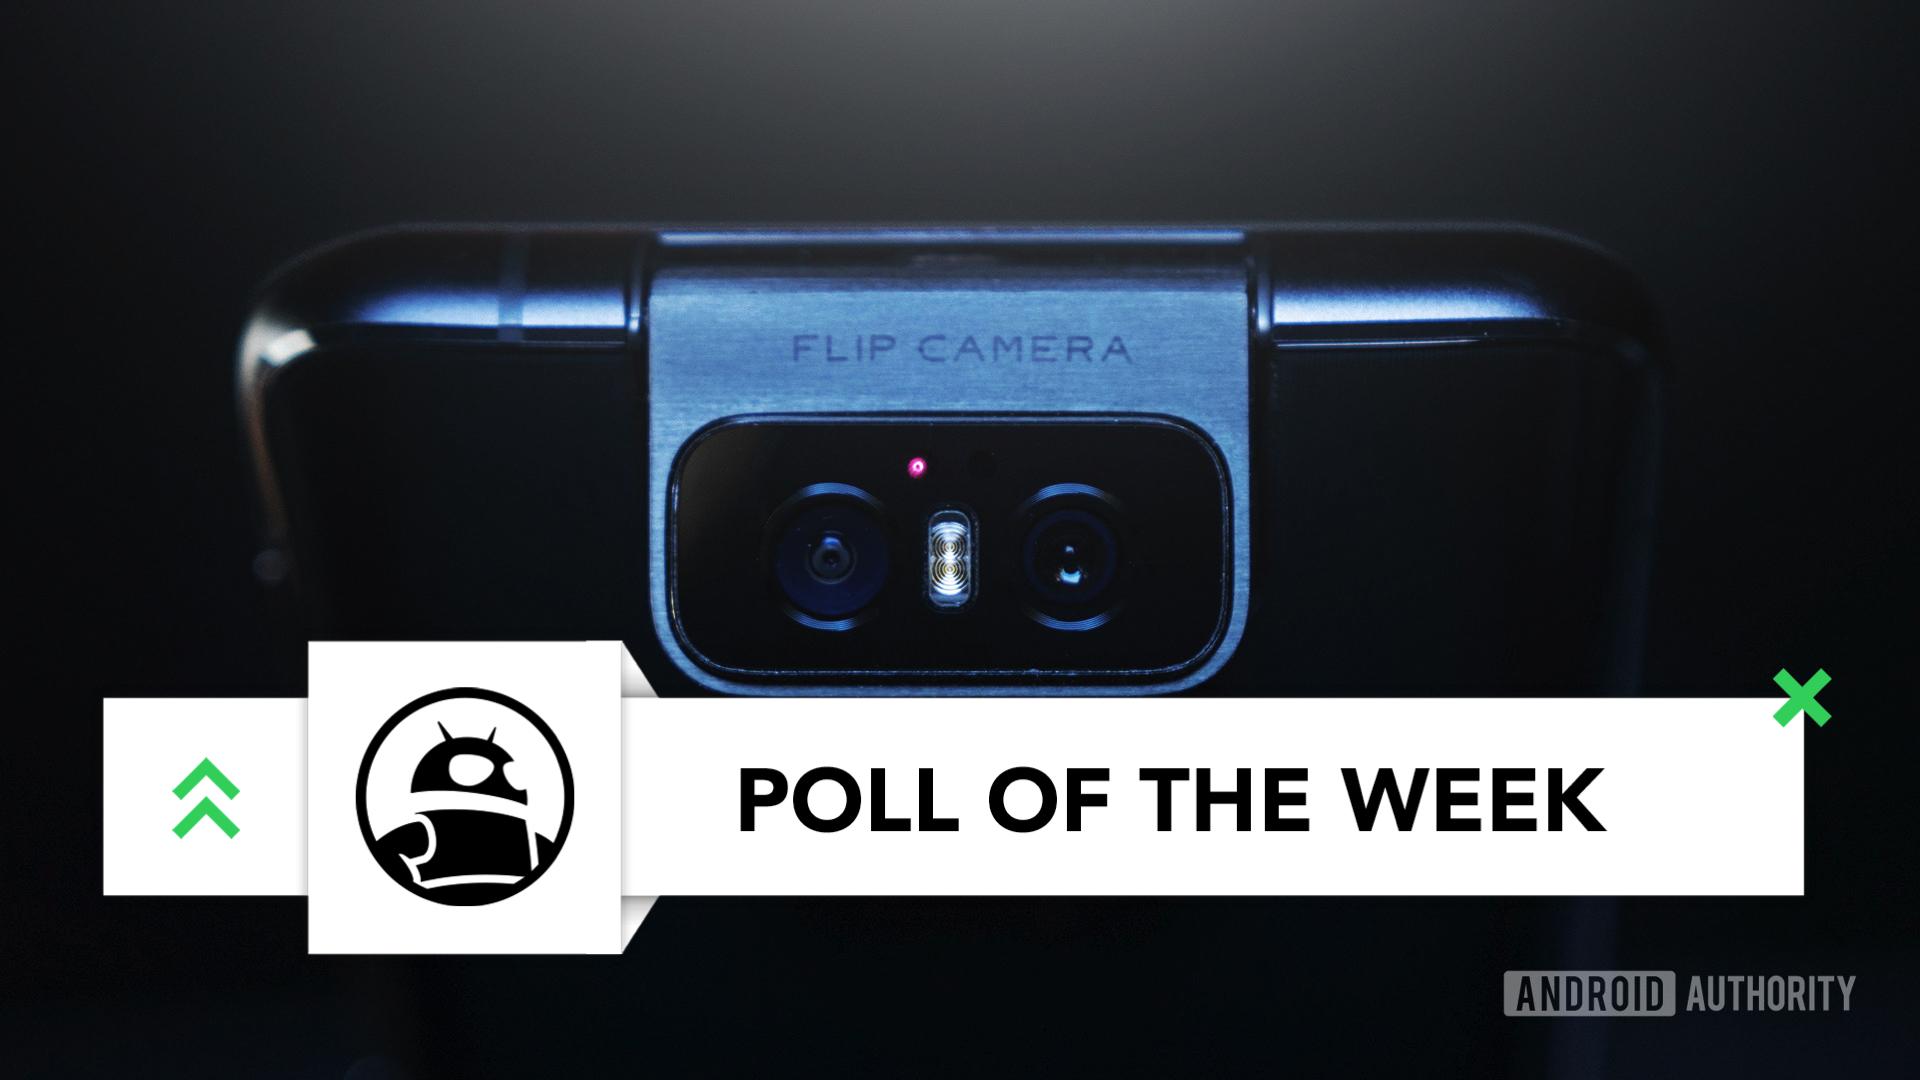 asus zenfone 6 flip camera poll of the week